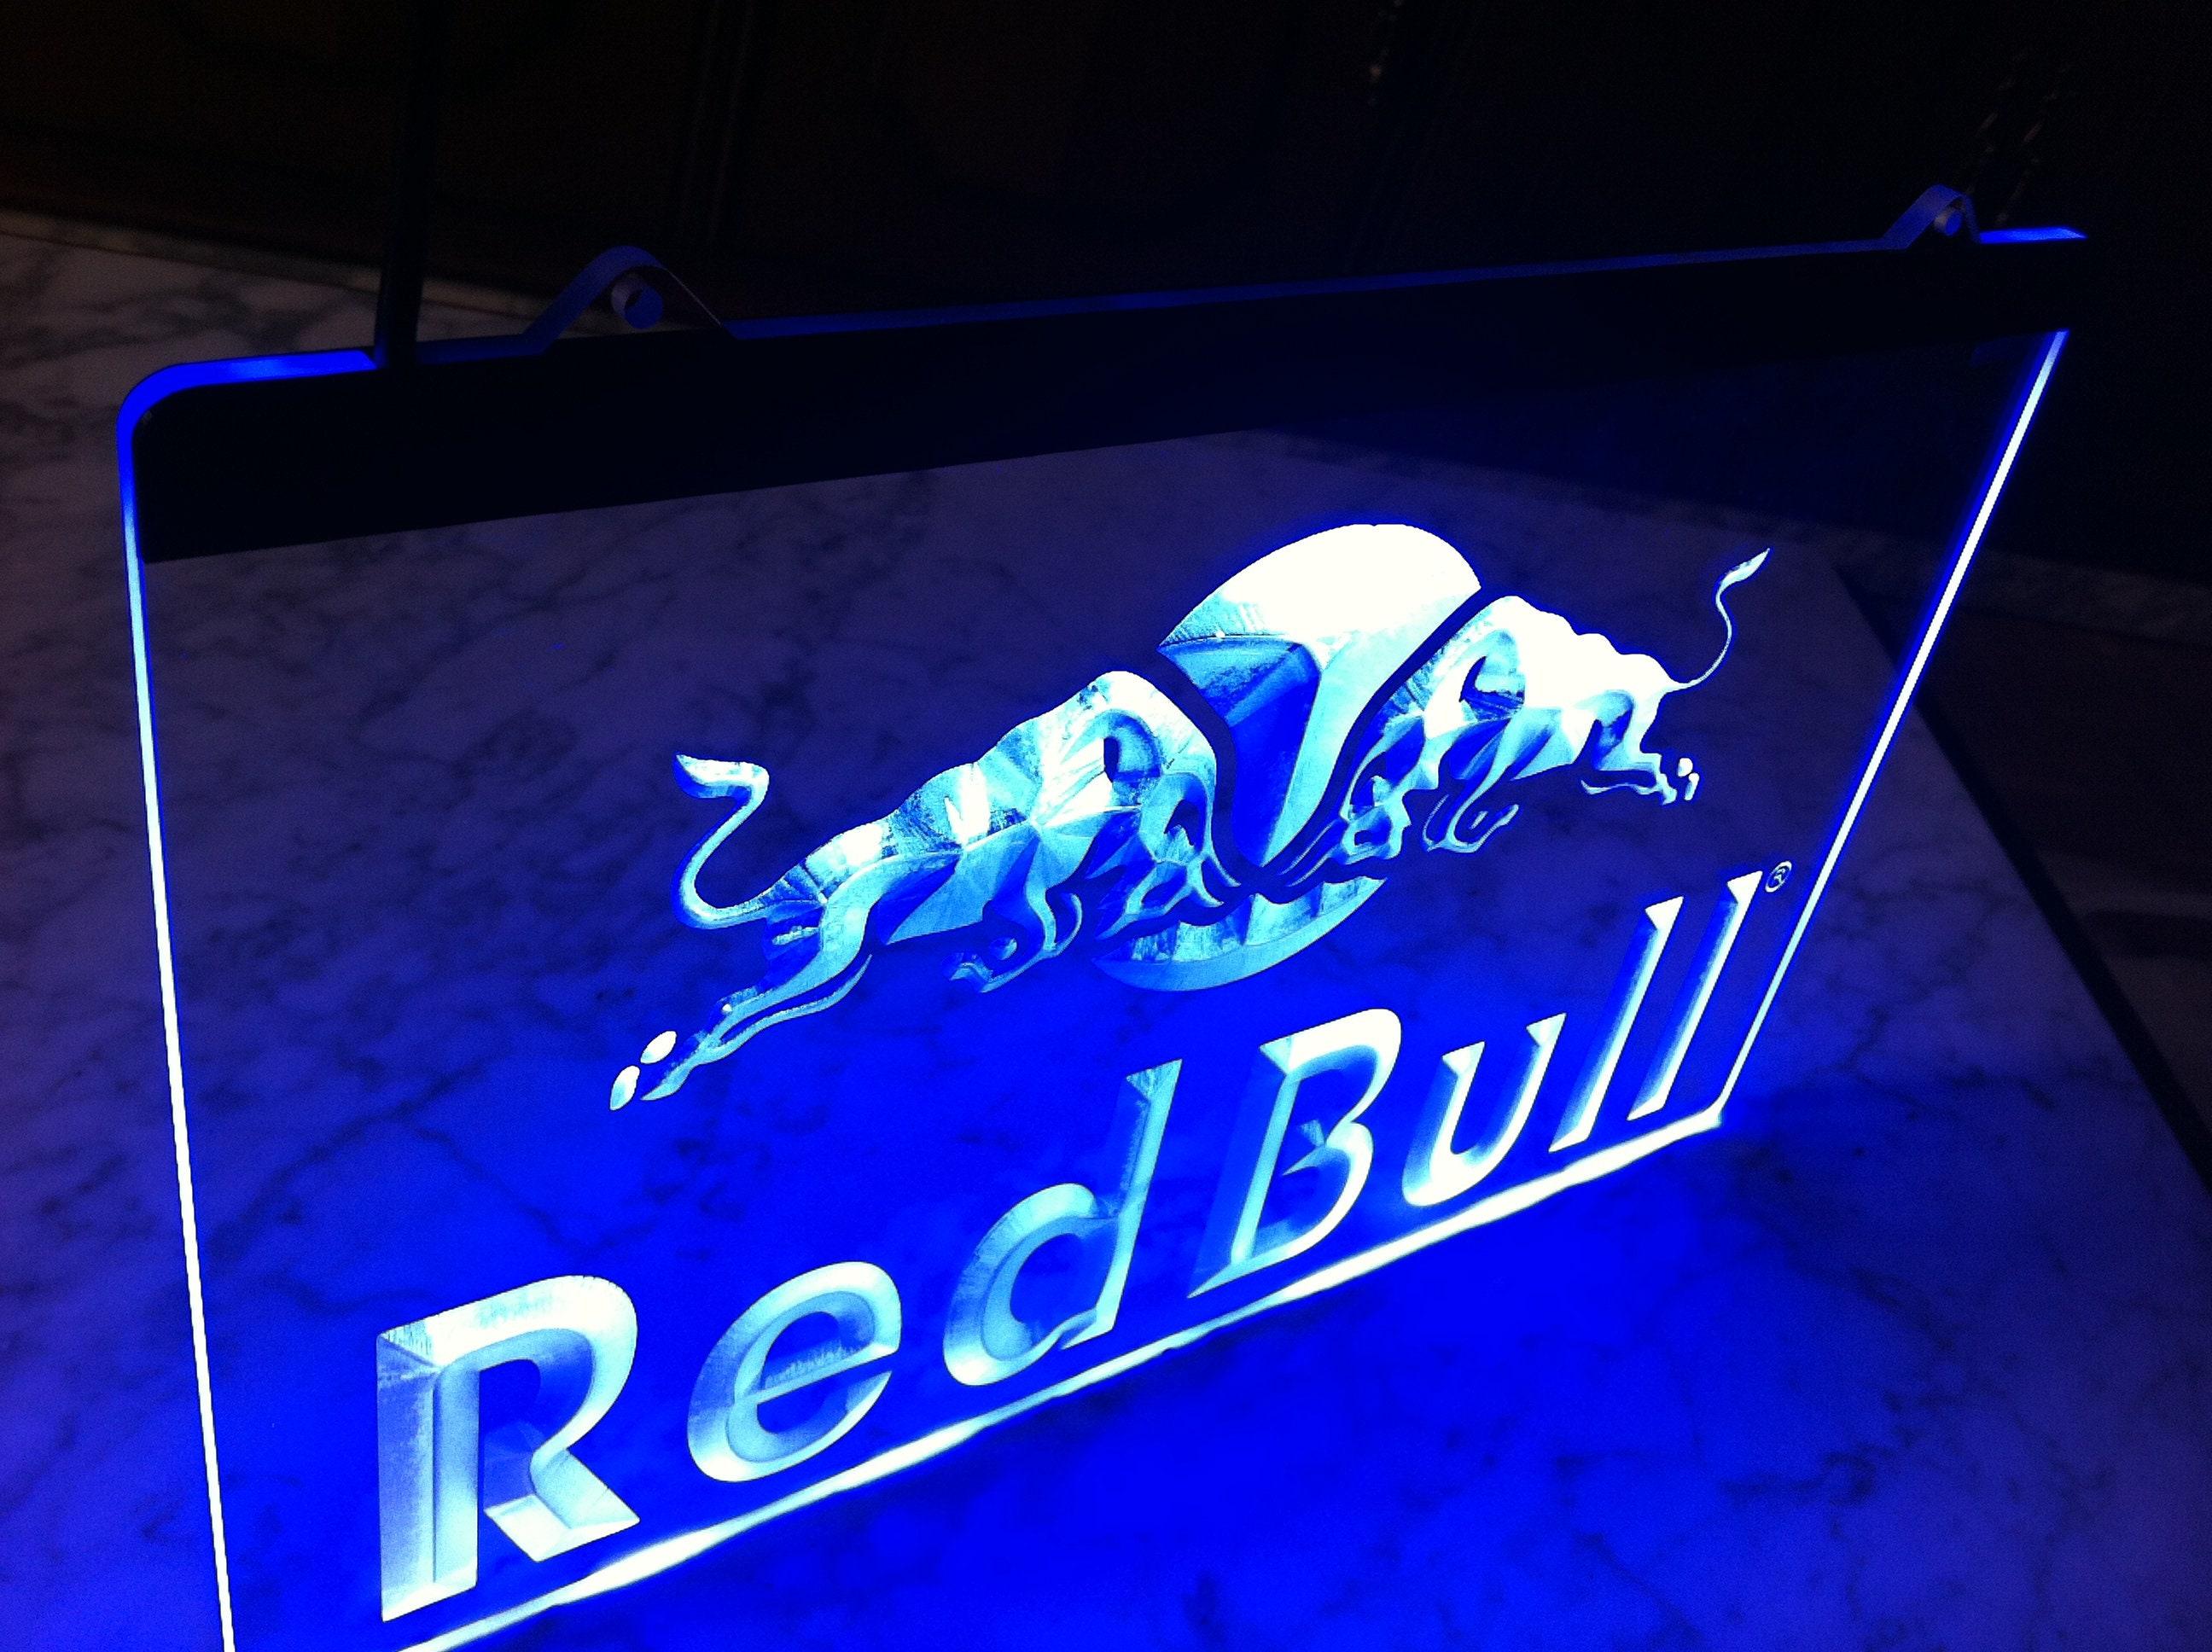 Neon A Accrocher Au Mur red bull logo led lamp sign box poster energy drink redbull